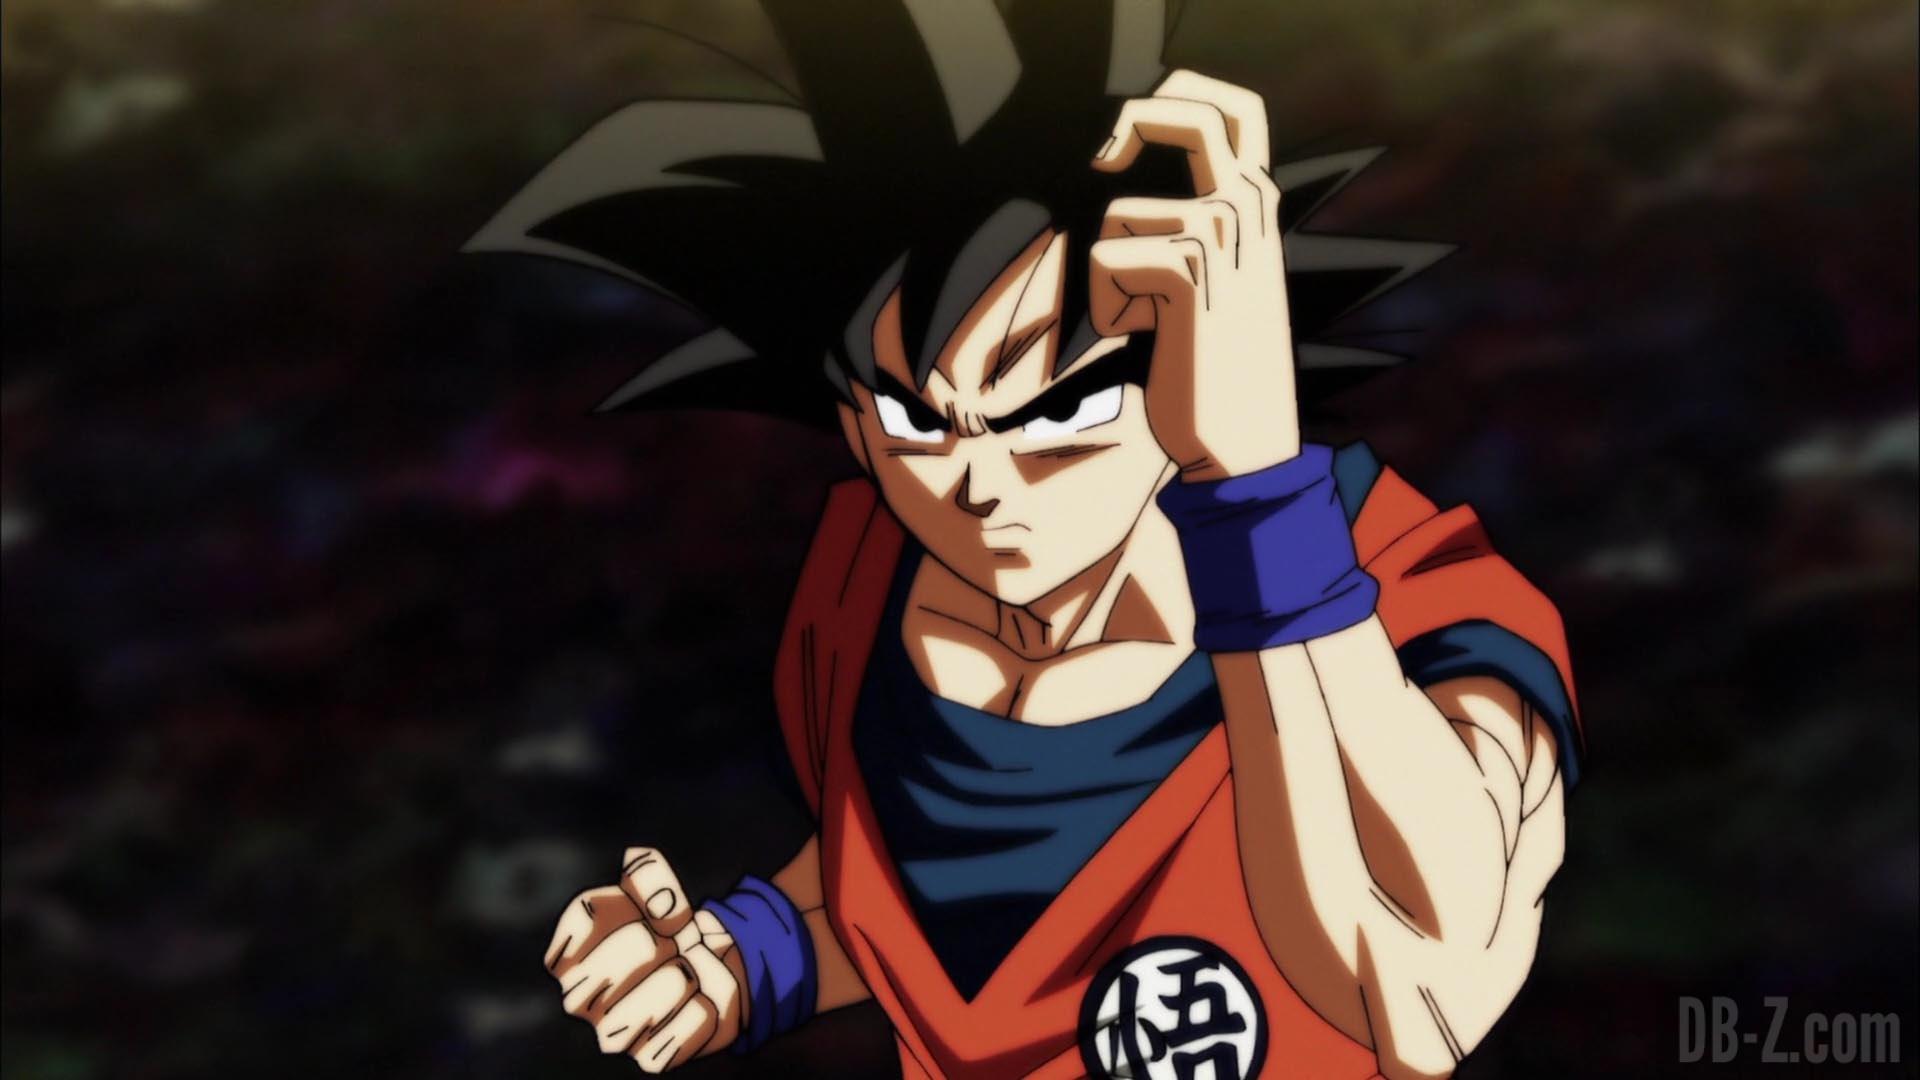 Dragon-Ball-Super-Episode-99-114-Goku.jp